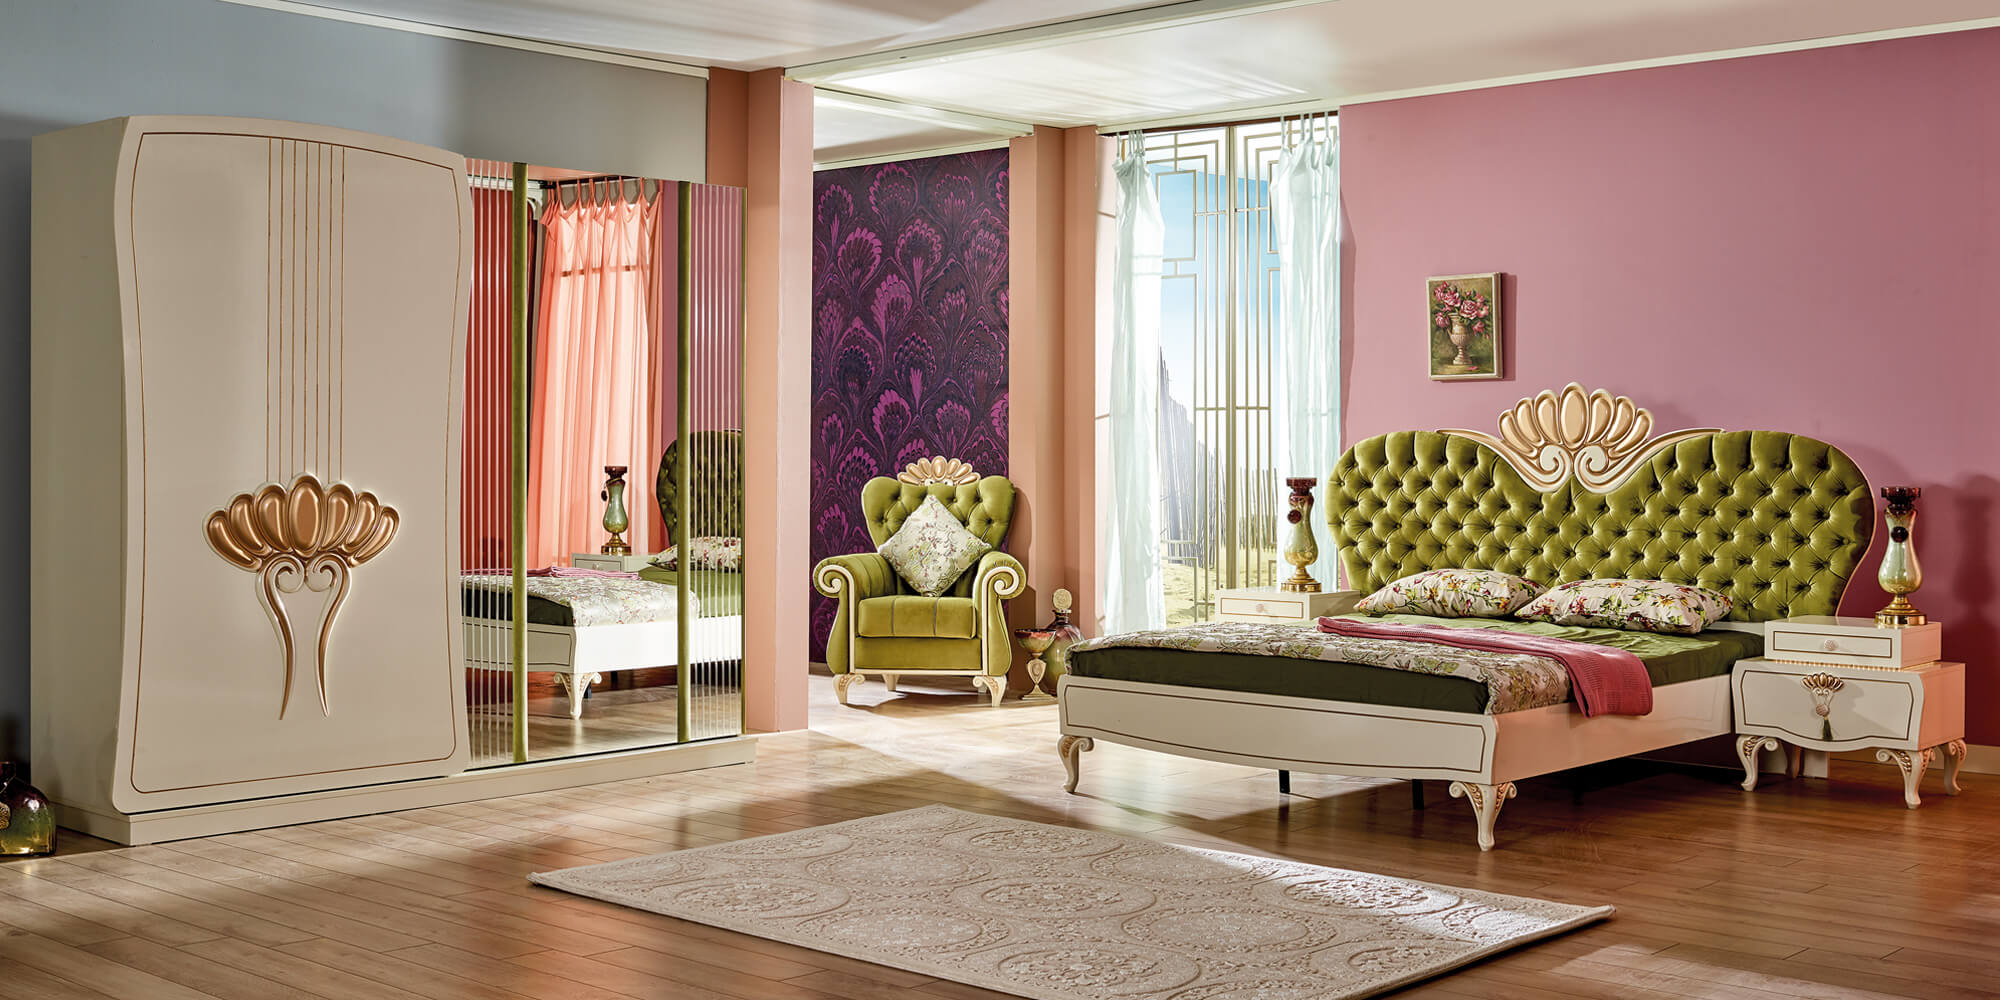 asur schlafzimmer komplett set yuvam m belhaus in. Black Bedroom Furniture Sets. Home Design Ideas